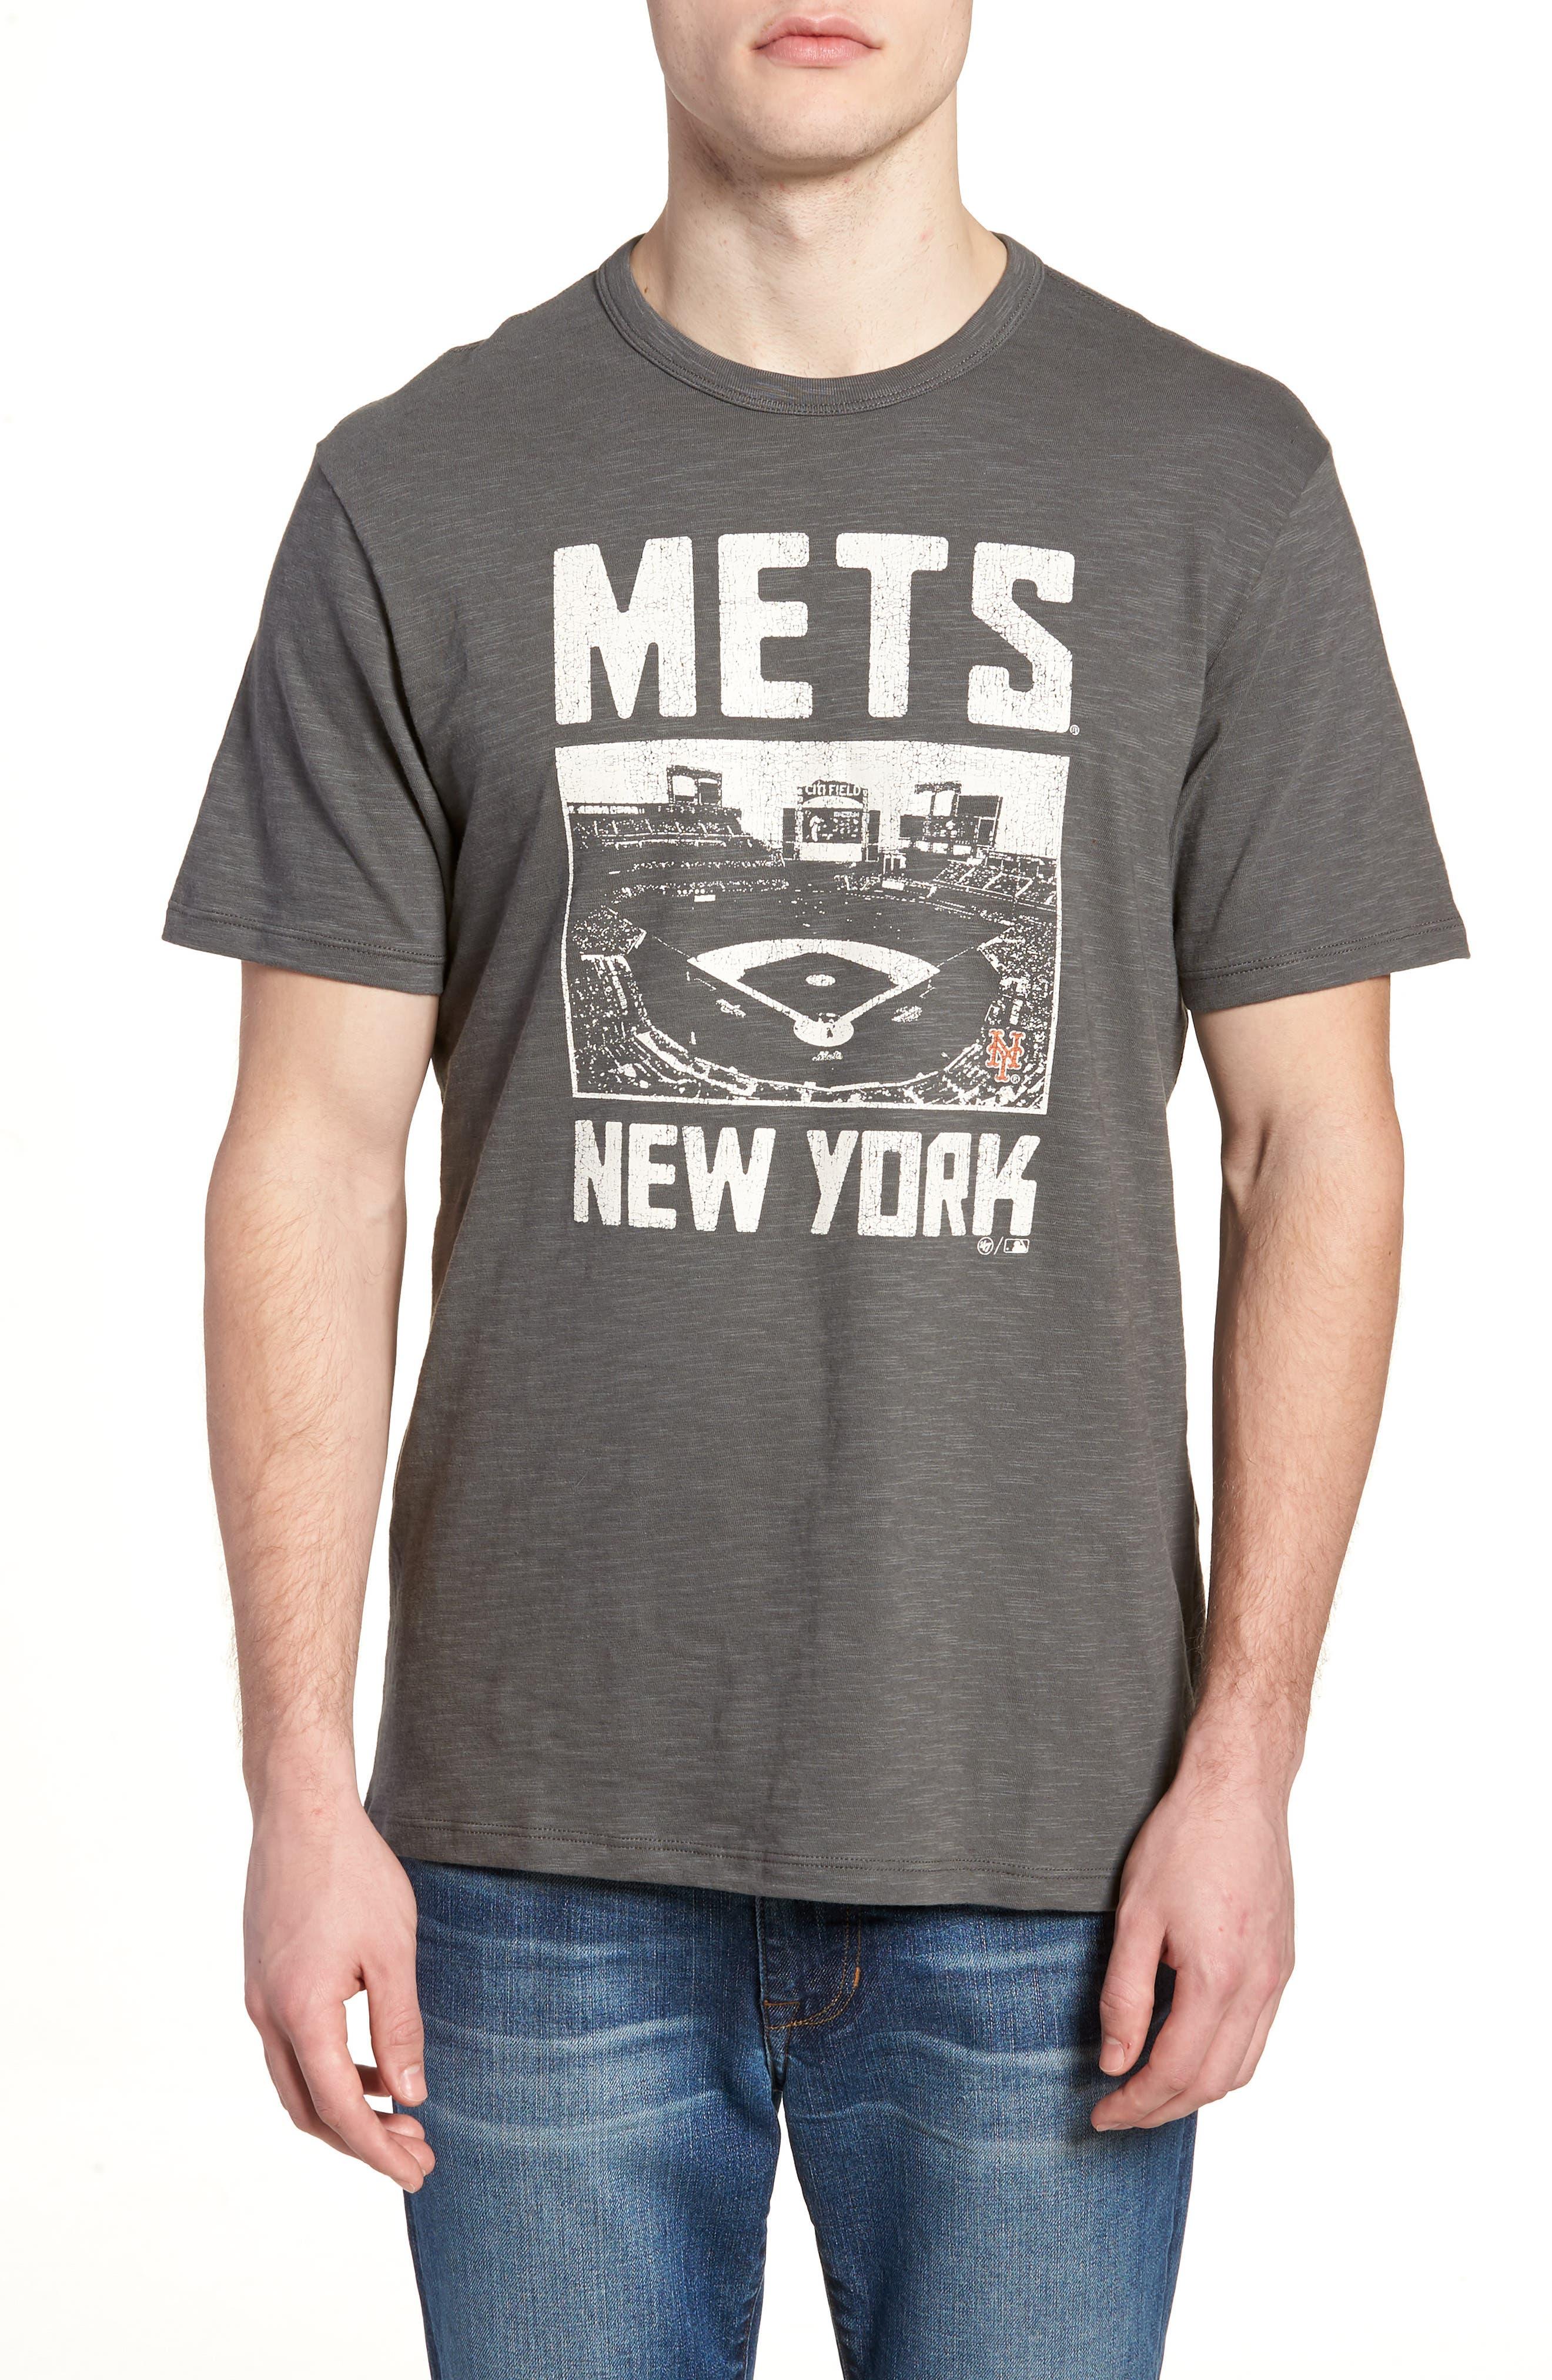 MLB Overdrive Scrum New York Mets T-Shirt,                             Main thumbnail 1, color,                             Submarine